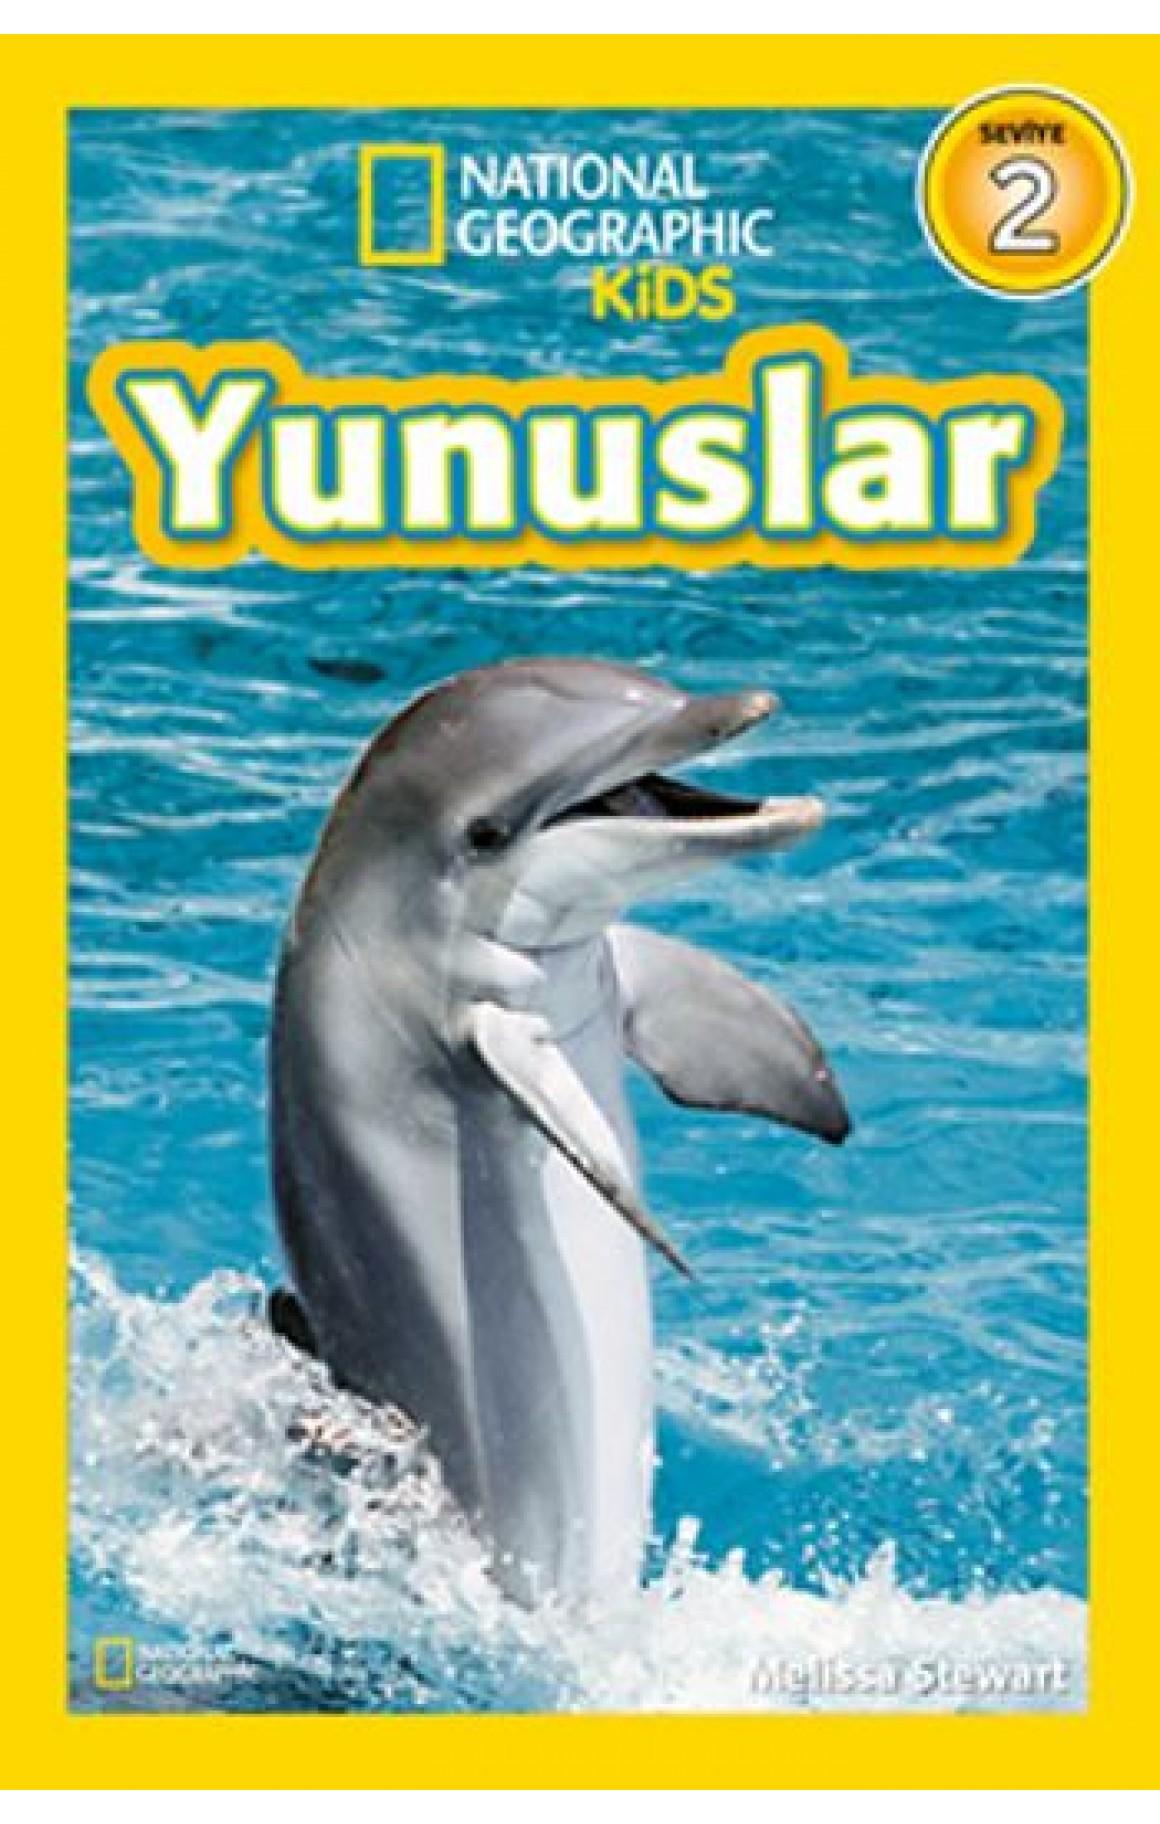 National Geographic Kids - Yunuslar